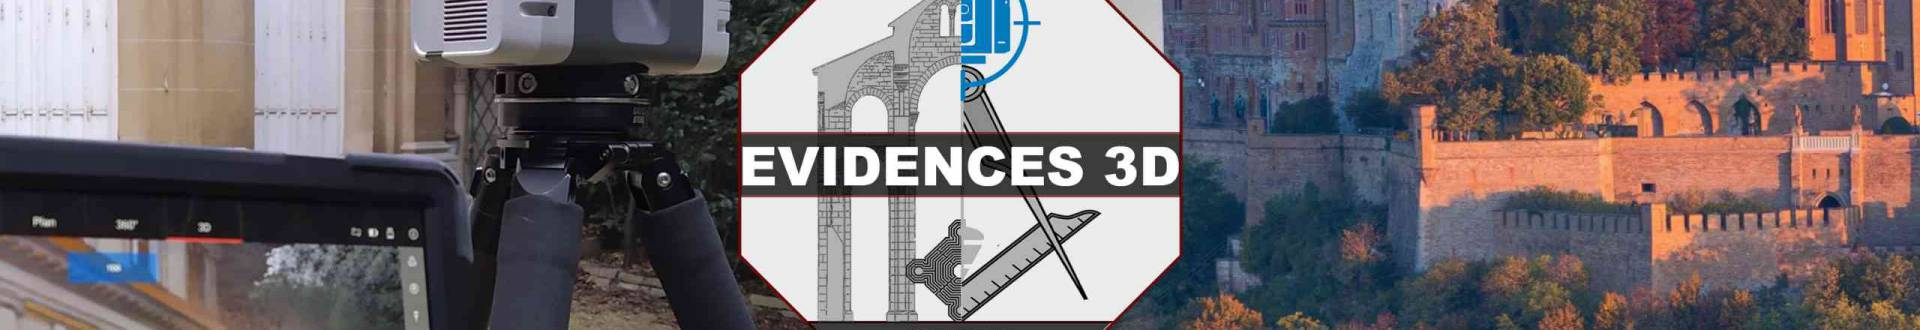 Evidences 3D | Cluny France | 360 3D VR tours